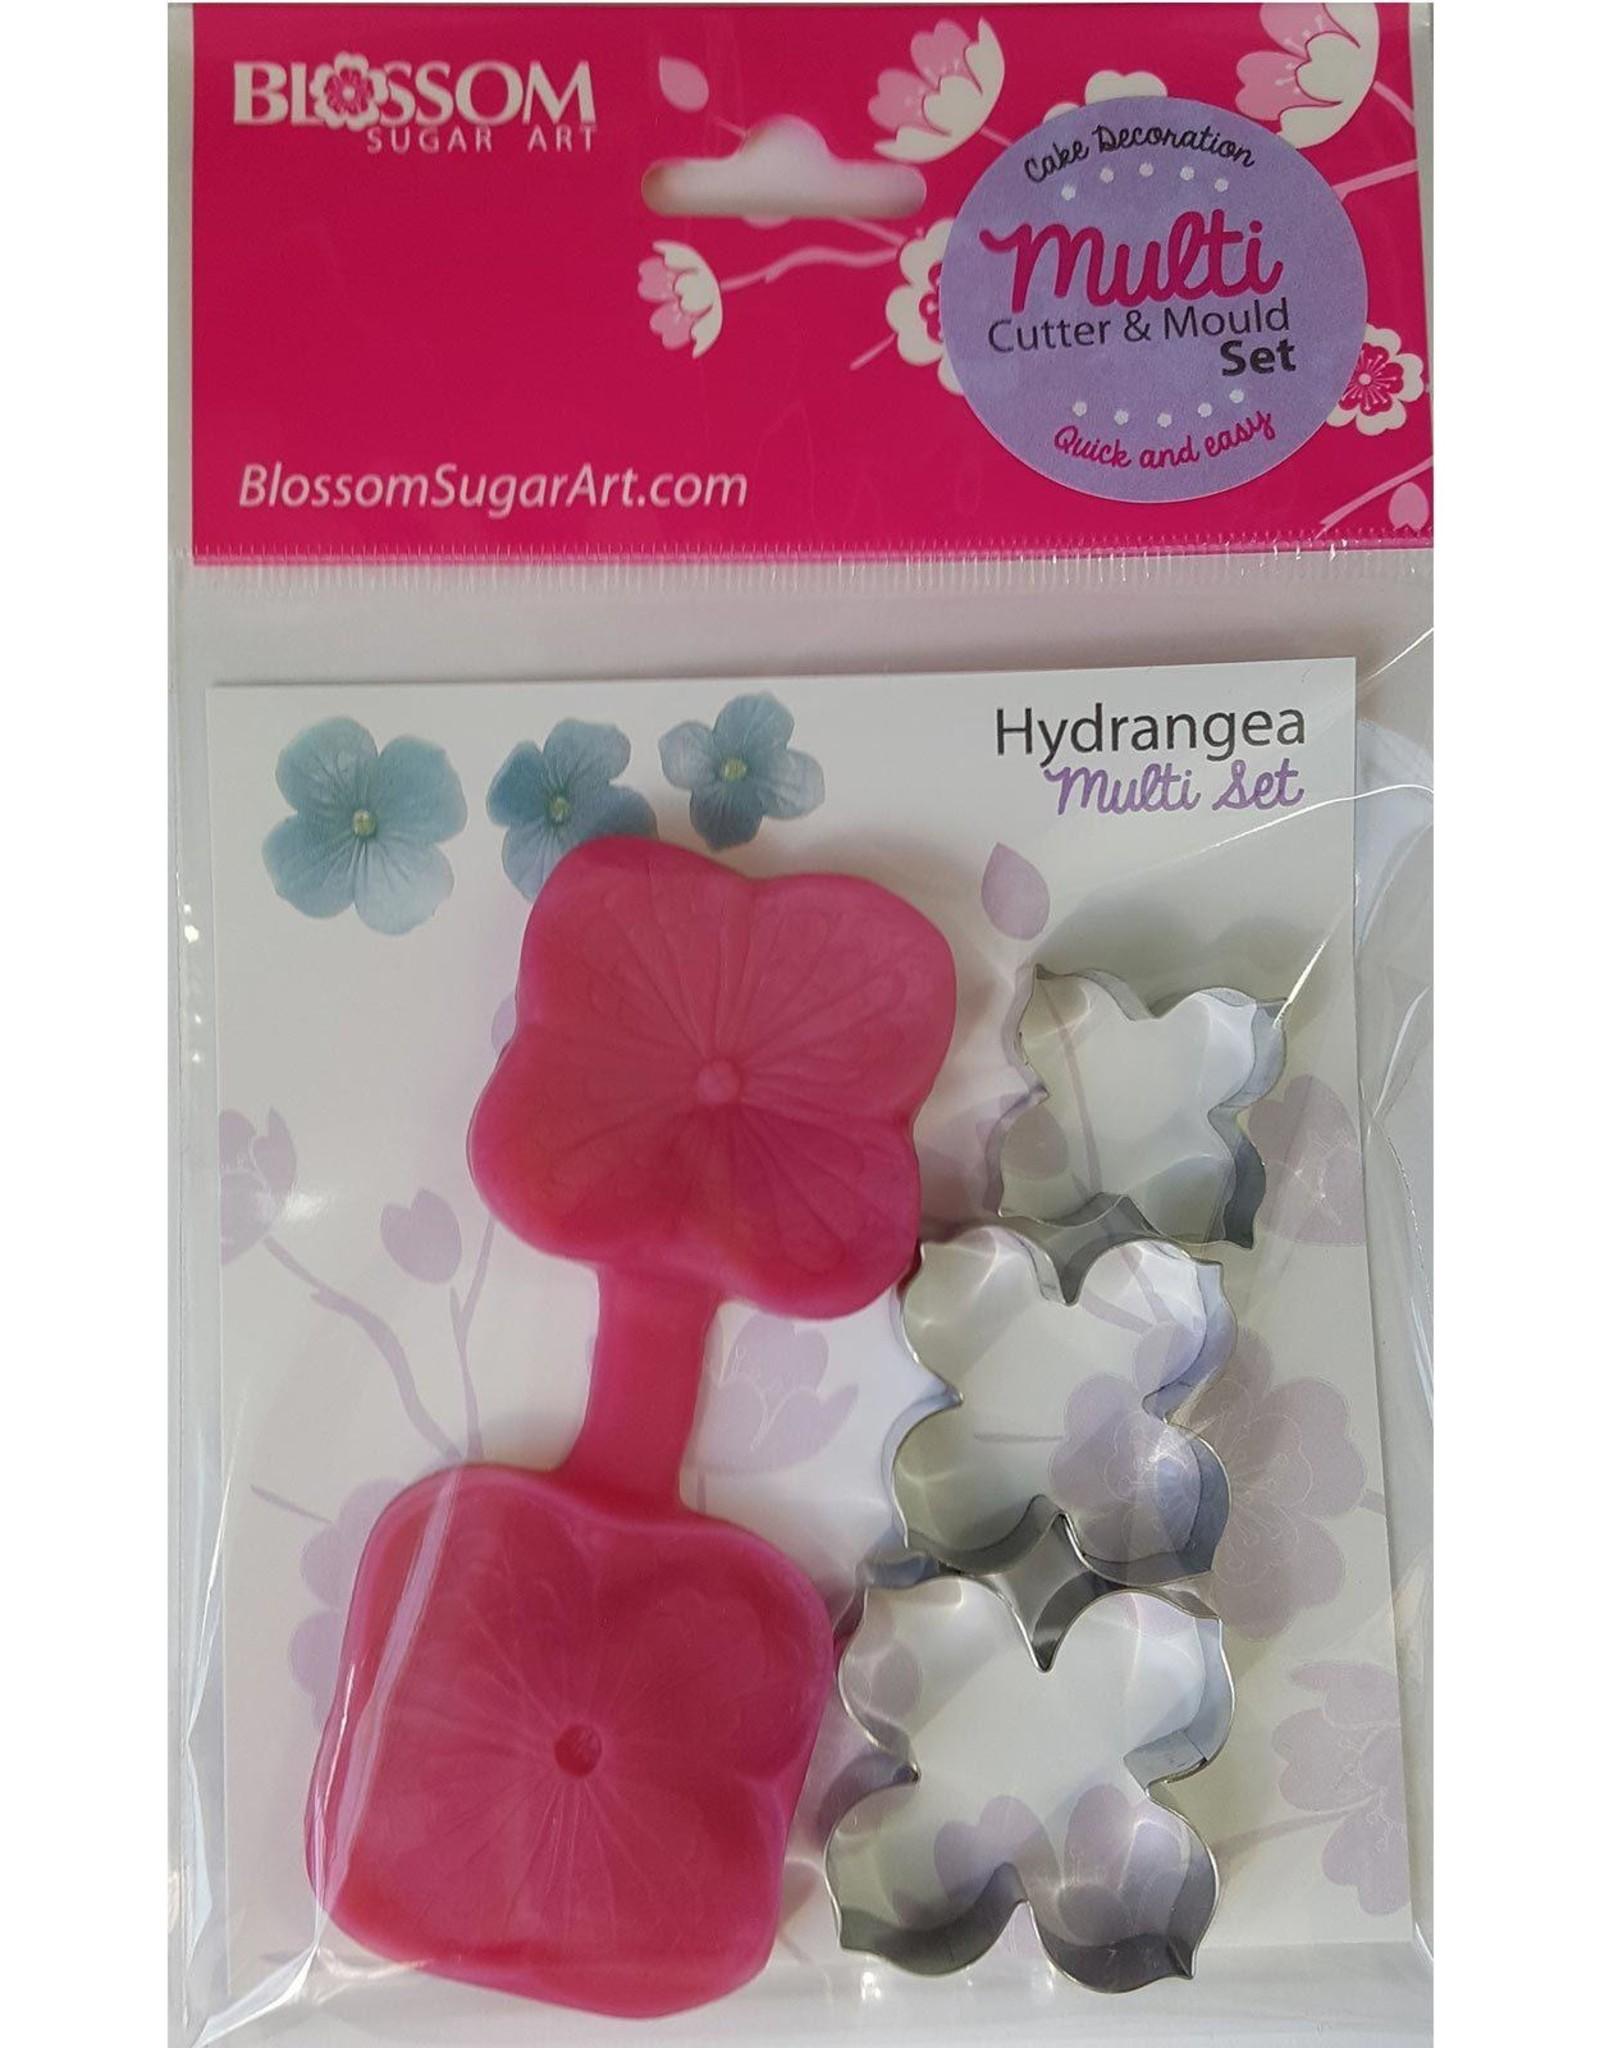 Blossom Sugar Art Blossom Sugar Art Cutter & Mould Multi Set Hydrangea